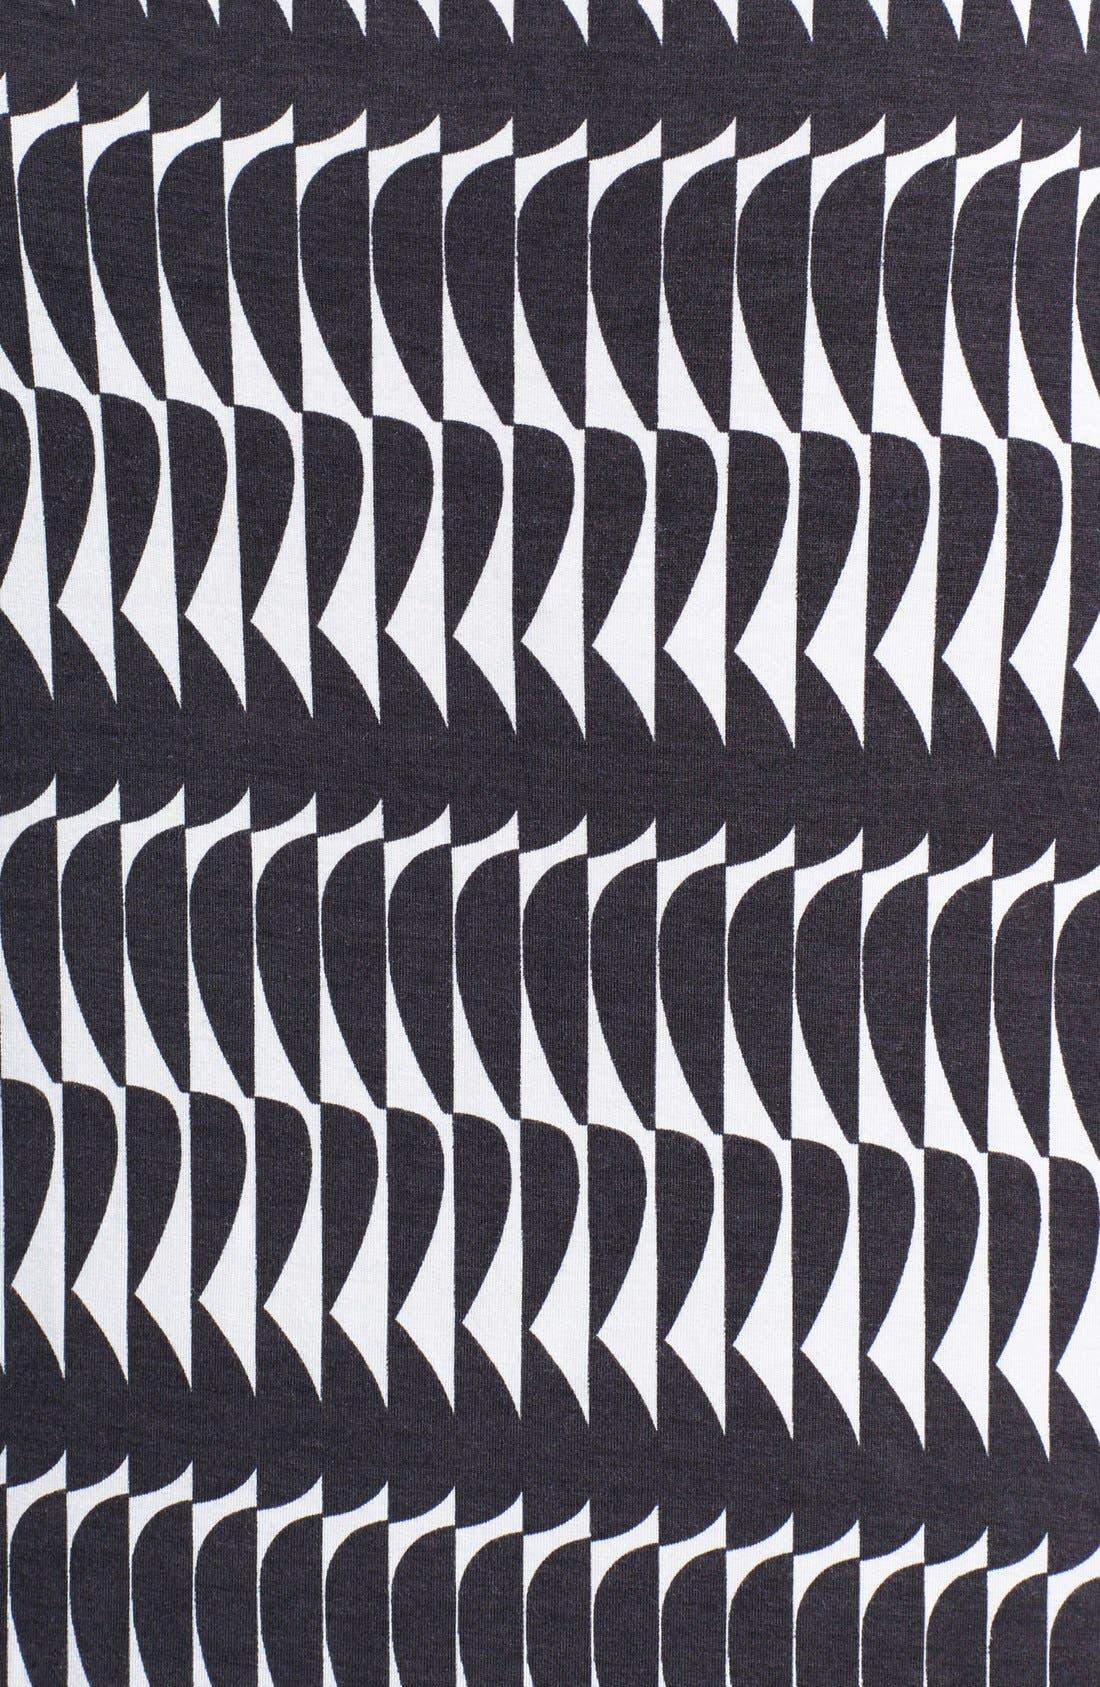 Drape Neck Print Top,                             Alternate thumbnail 3, color,                             Cream Cloud Optic Wave